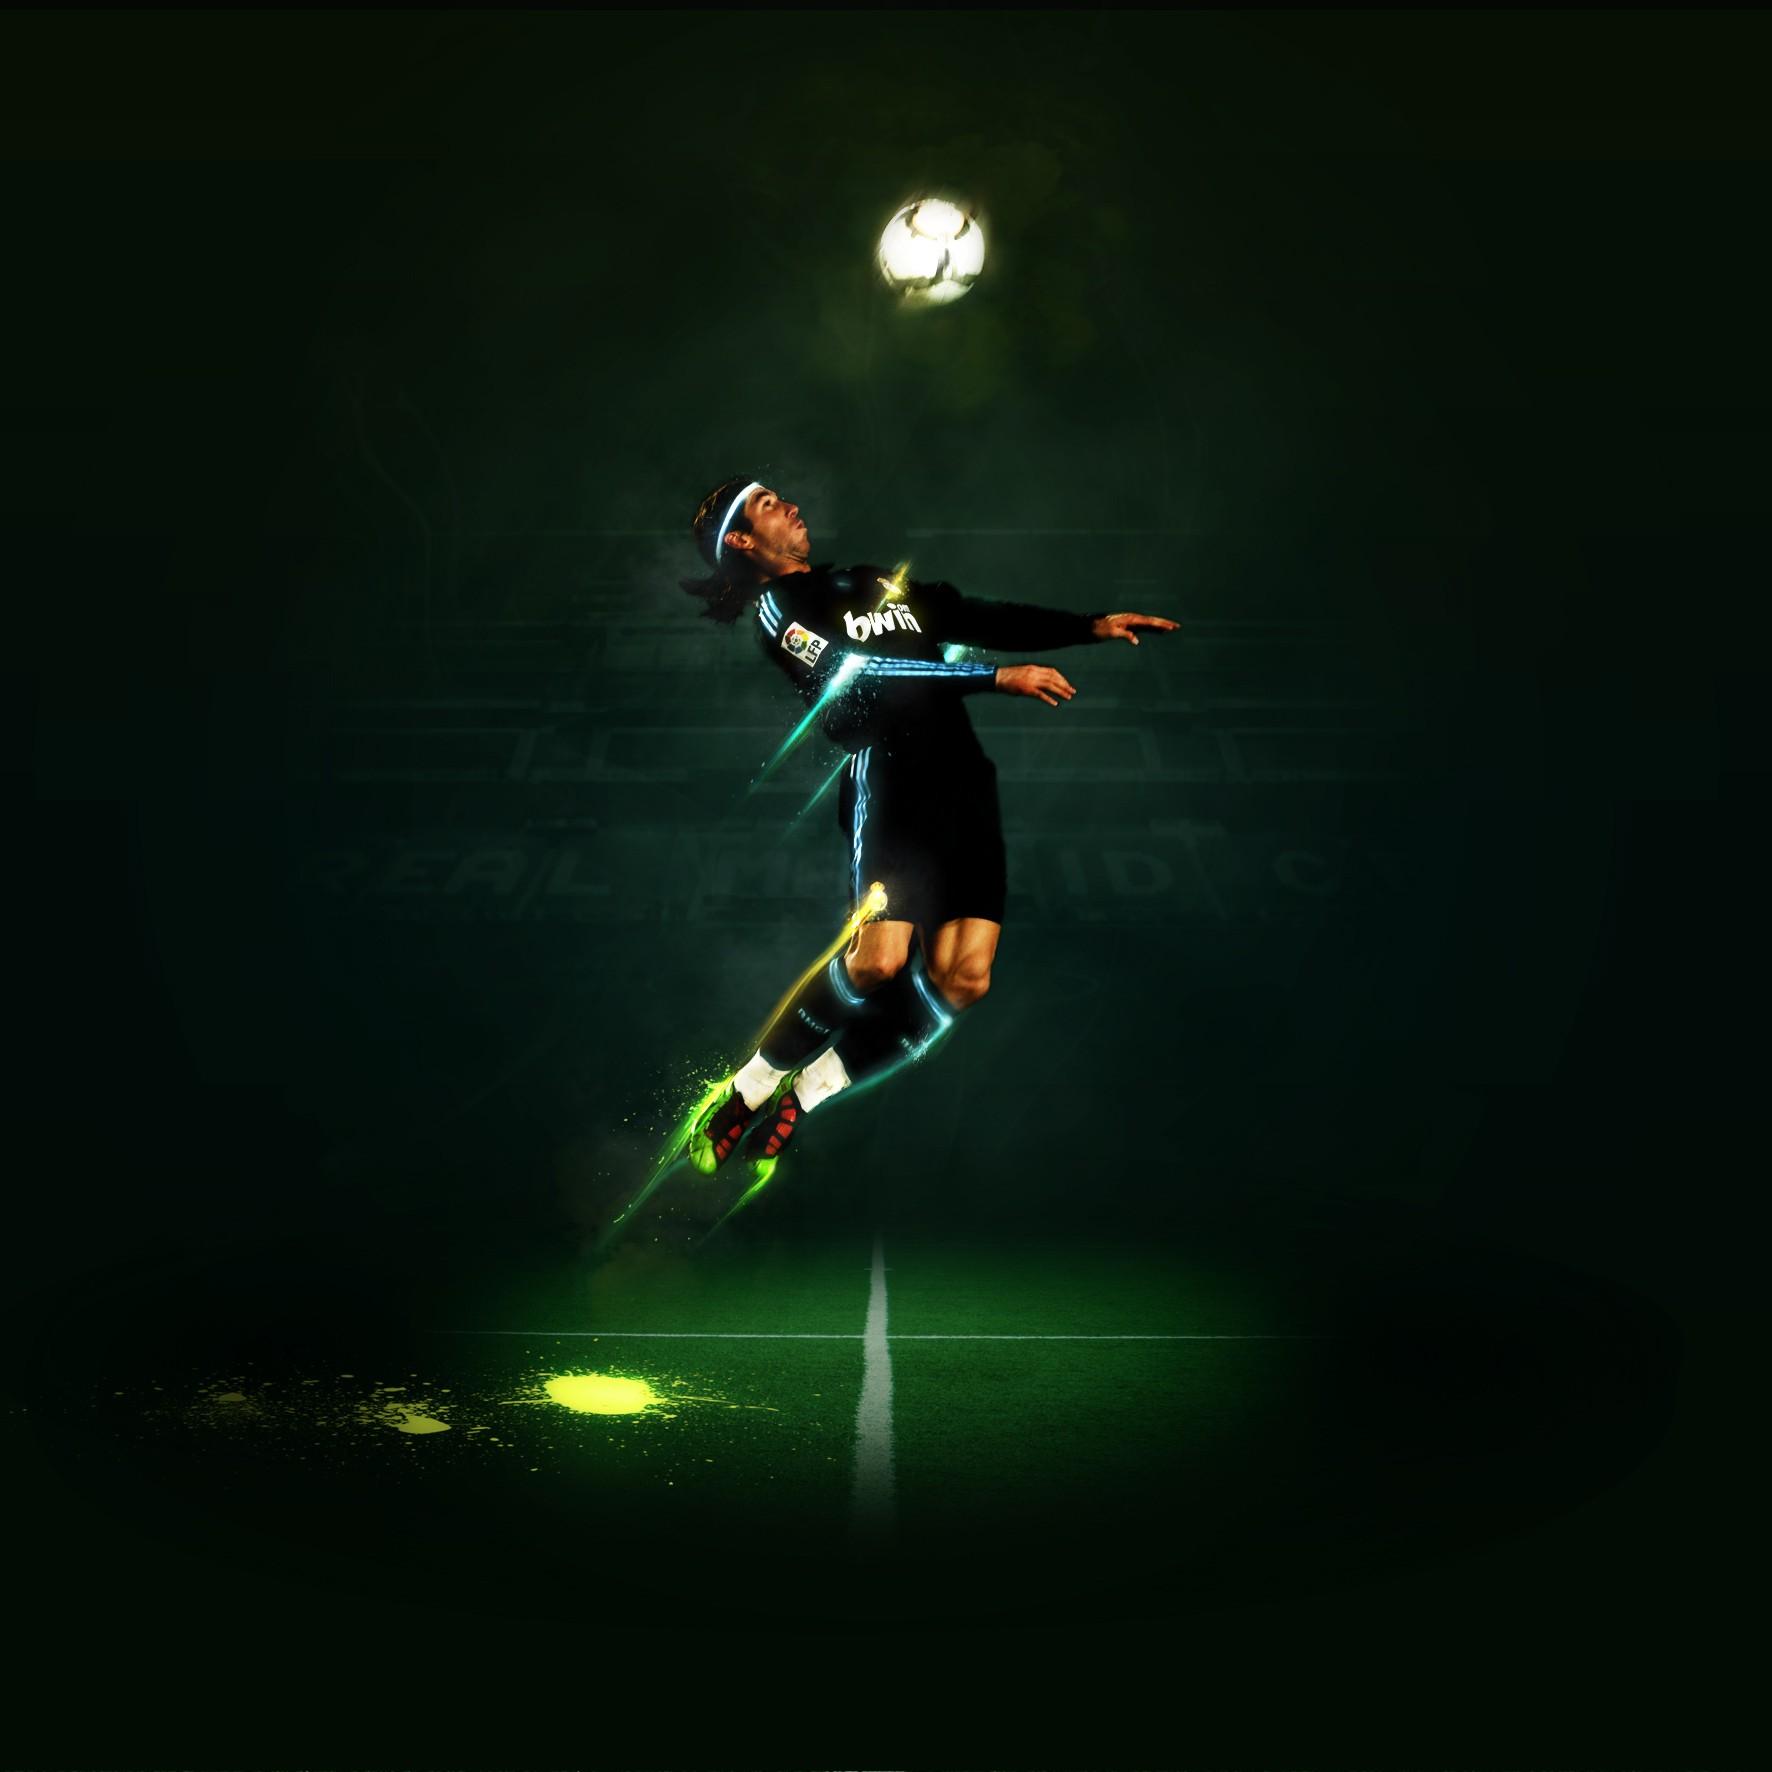 Wallpaper : night, jumping, green, stadium, soccer pitches